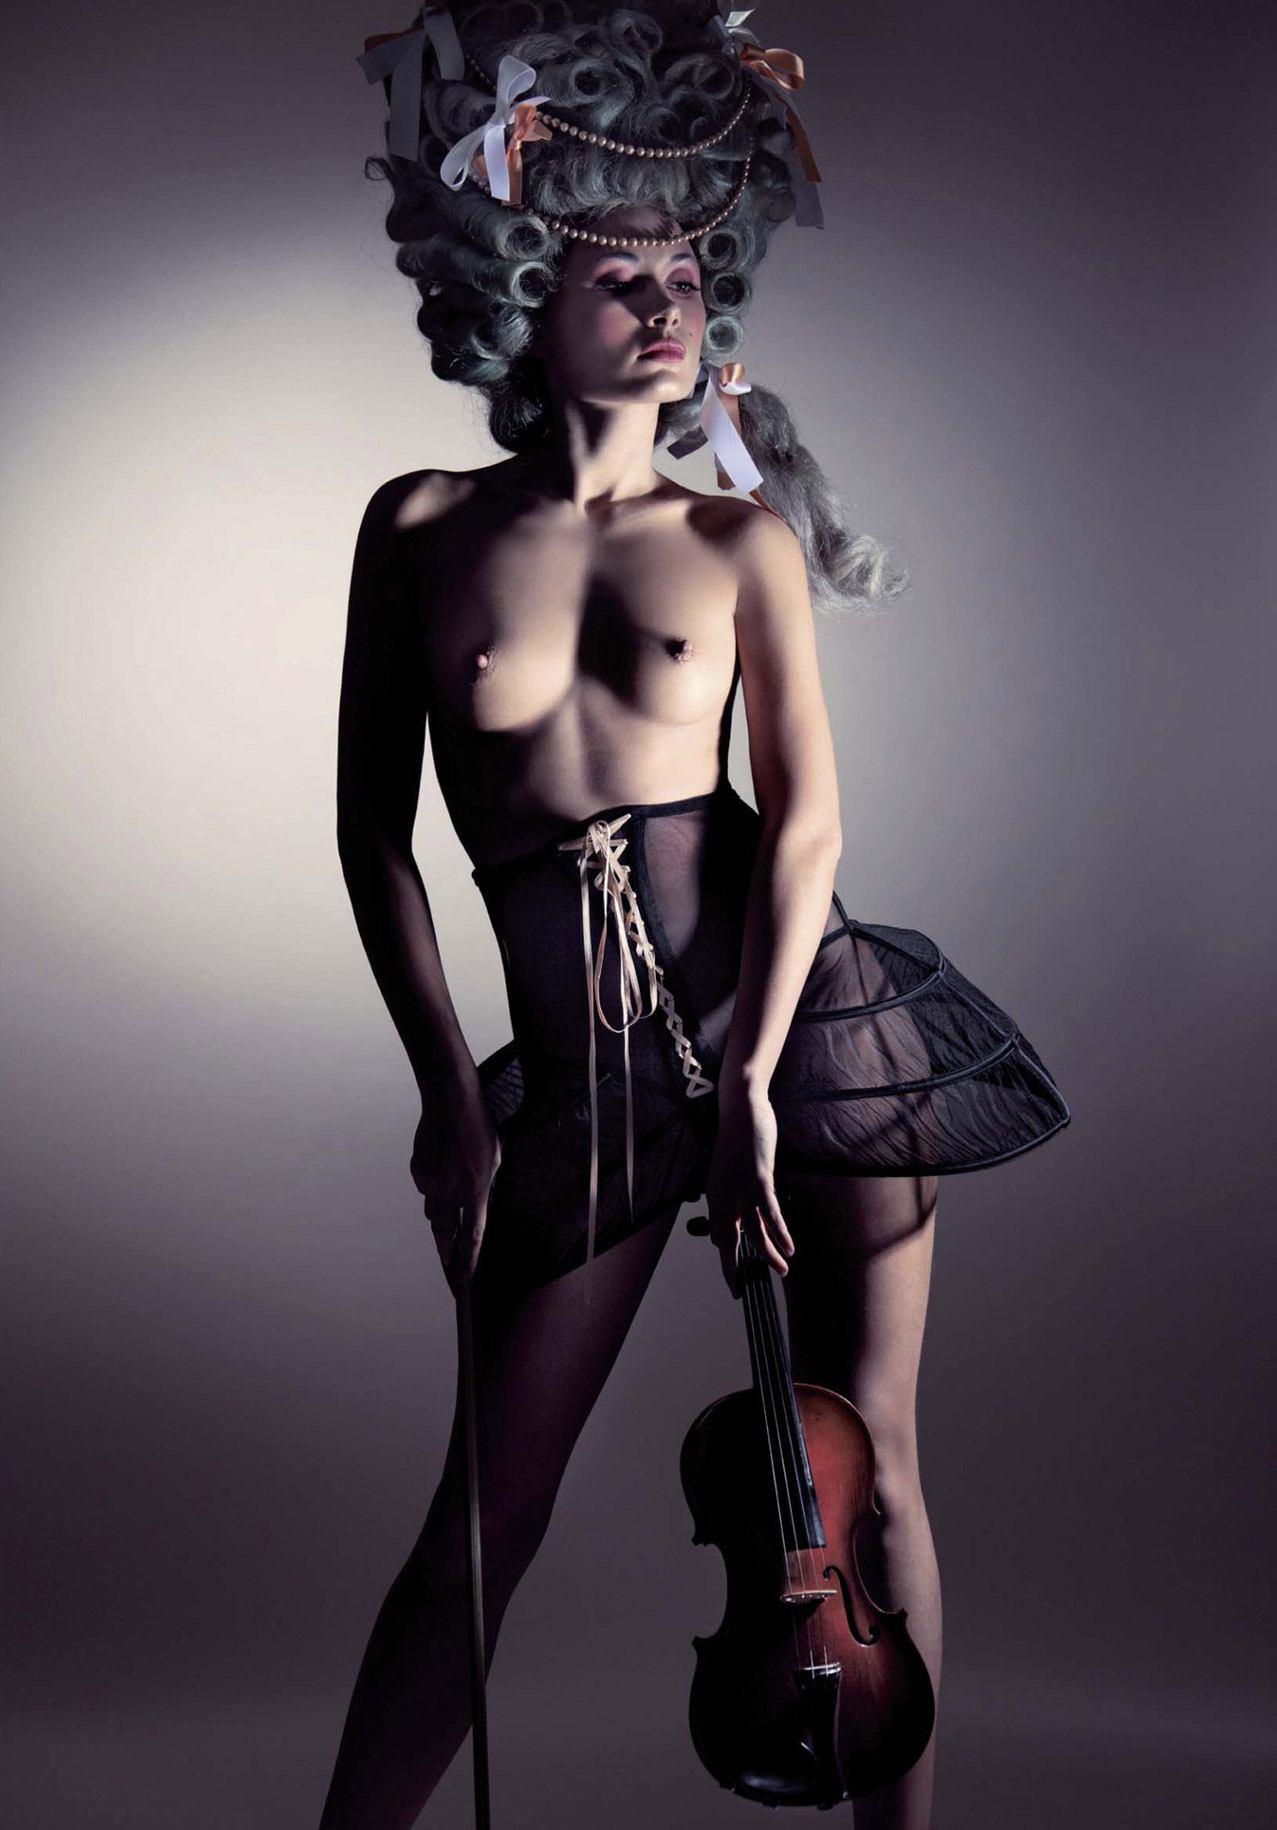 Анна Григоренко / Anna Grigorenko by Davide Esposito in Playboy France